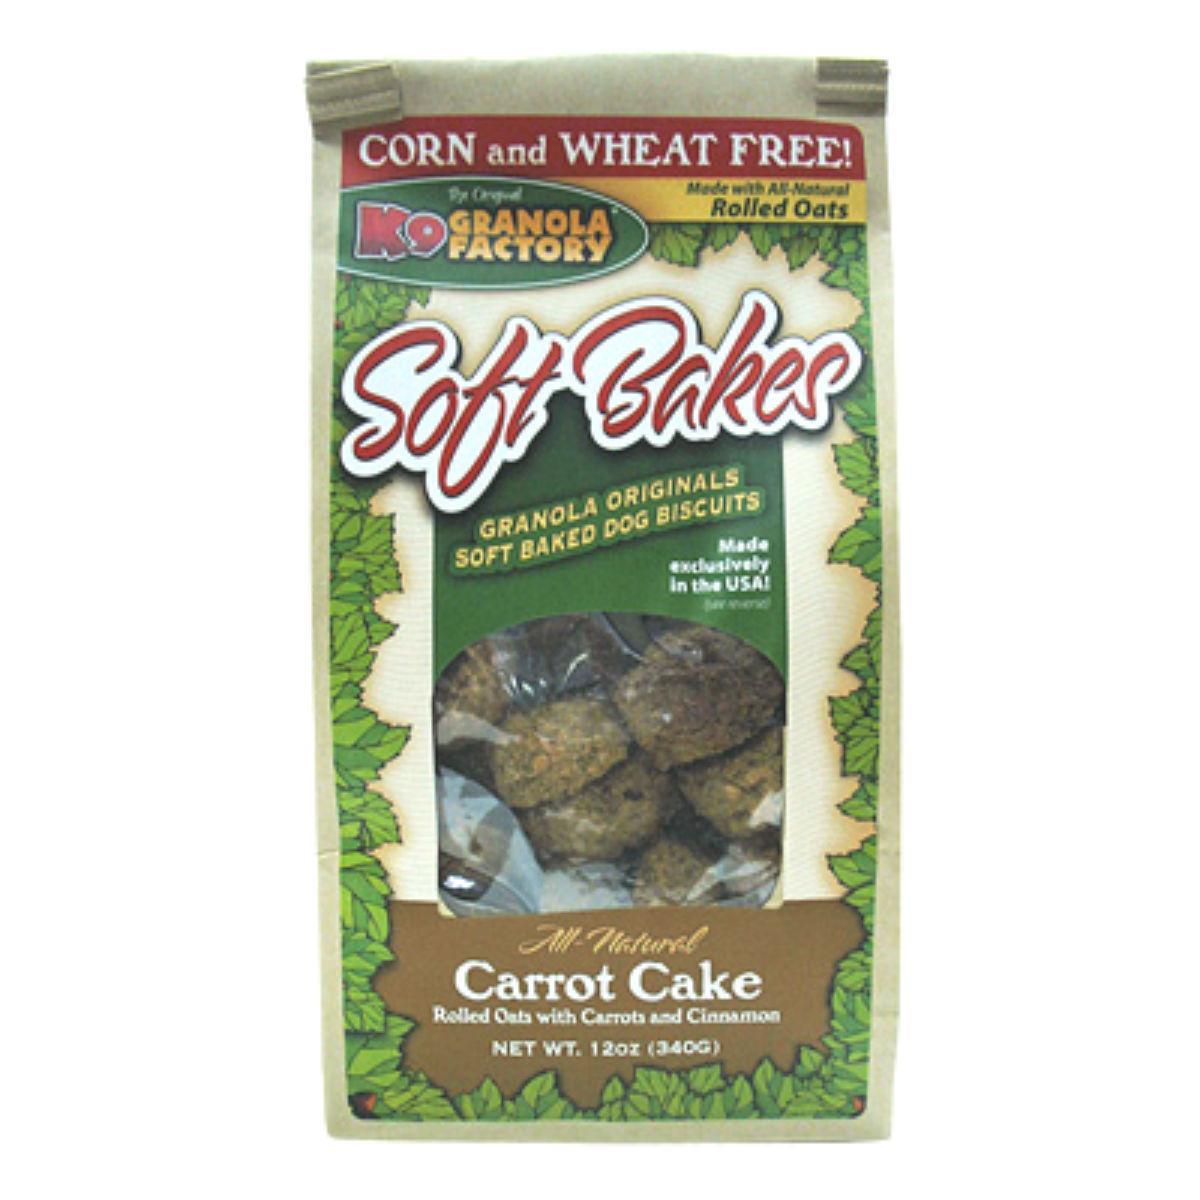 K9 Granola Factory Soft Bakes Dog Treat - Carrot Cake